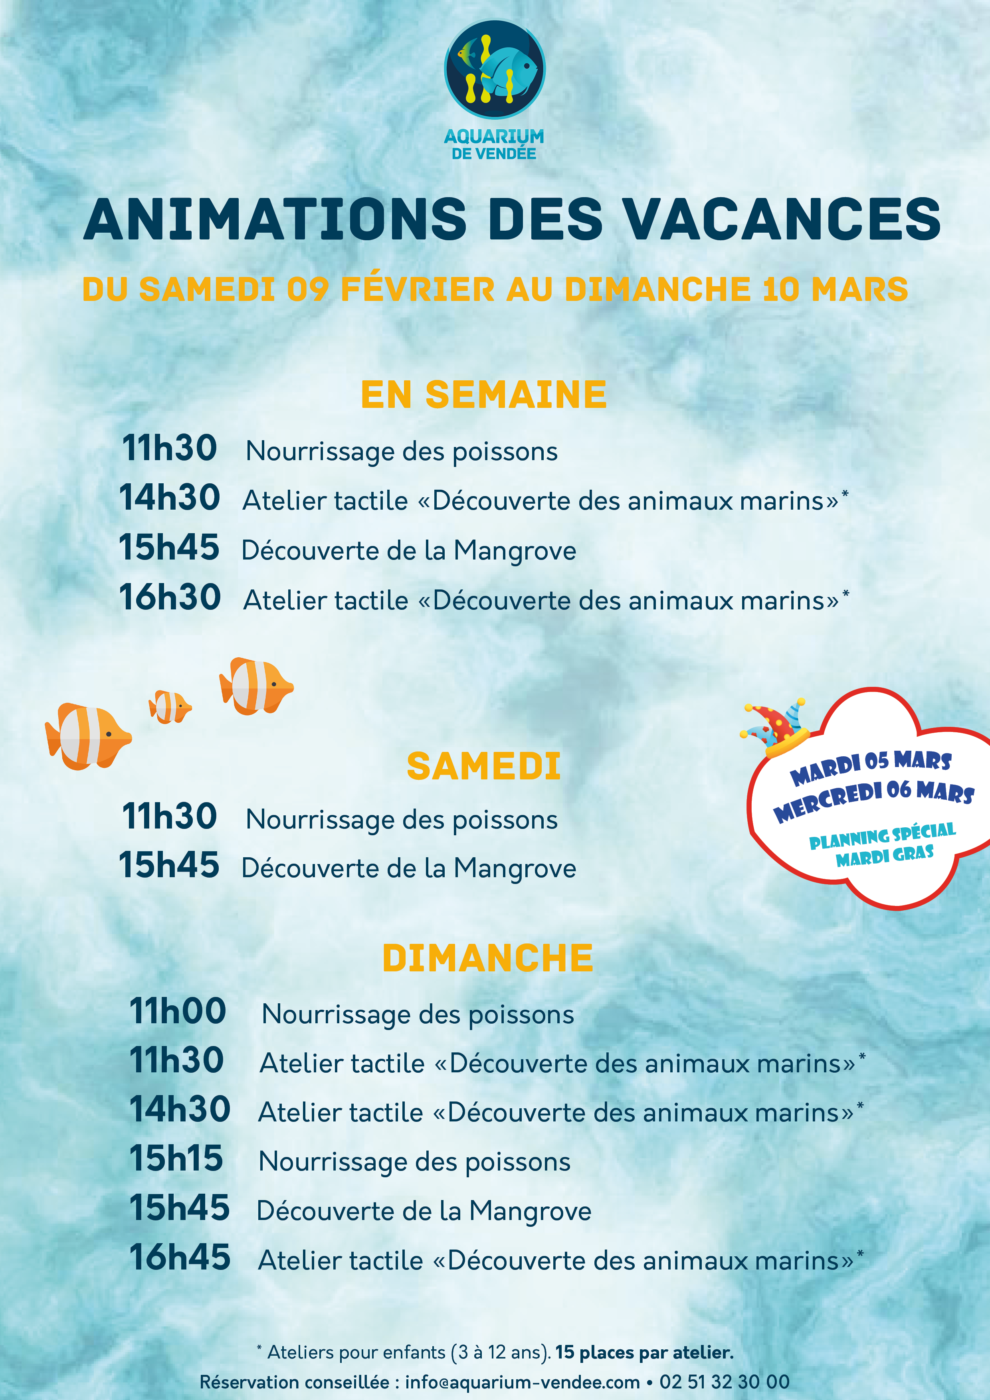 aquarium-talmont-saint-hilaire-vacances-hiver-aquarium-de-vendee